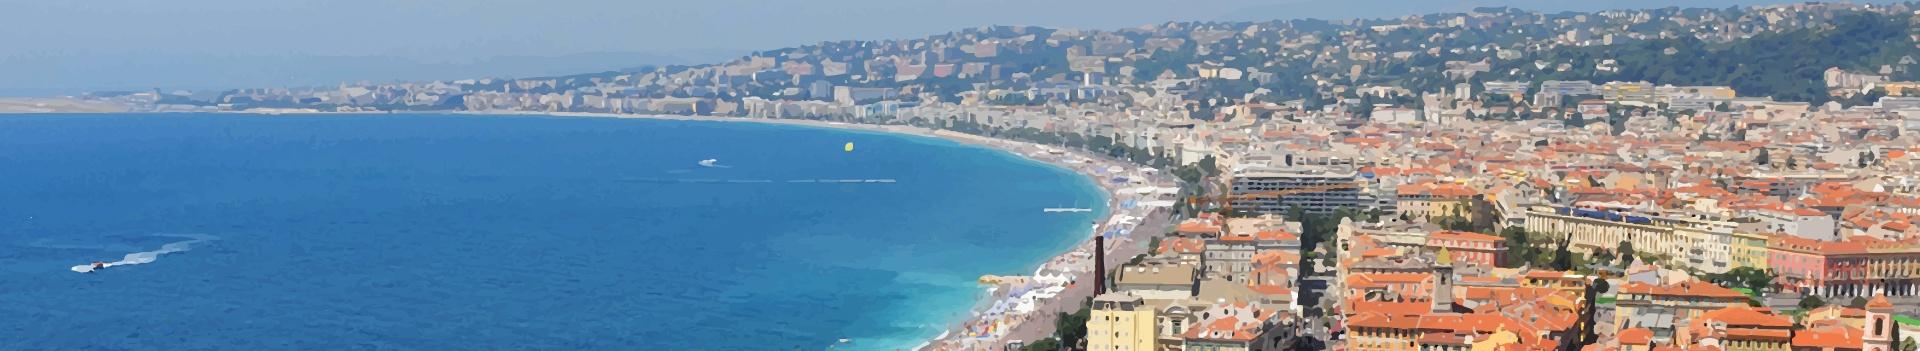 Kitesurfing in France